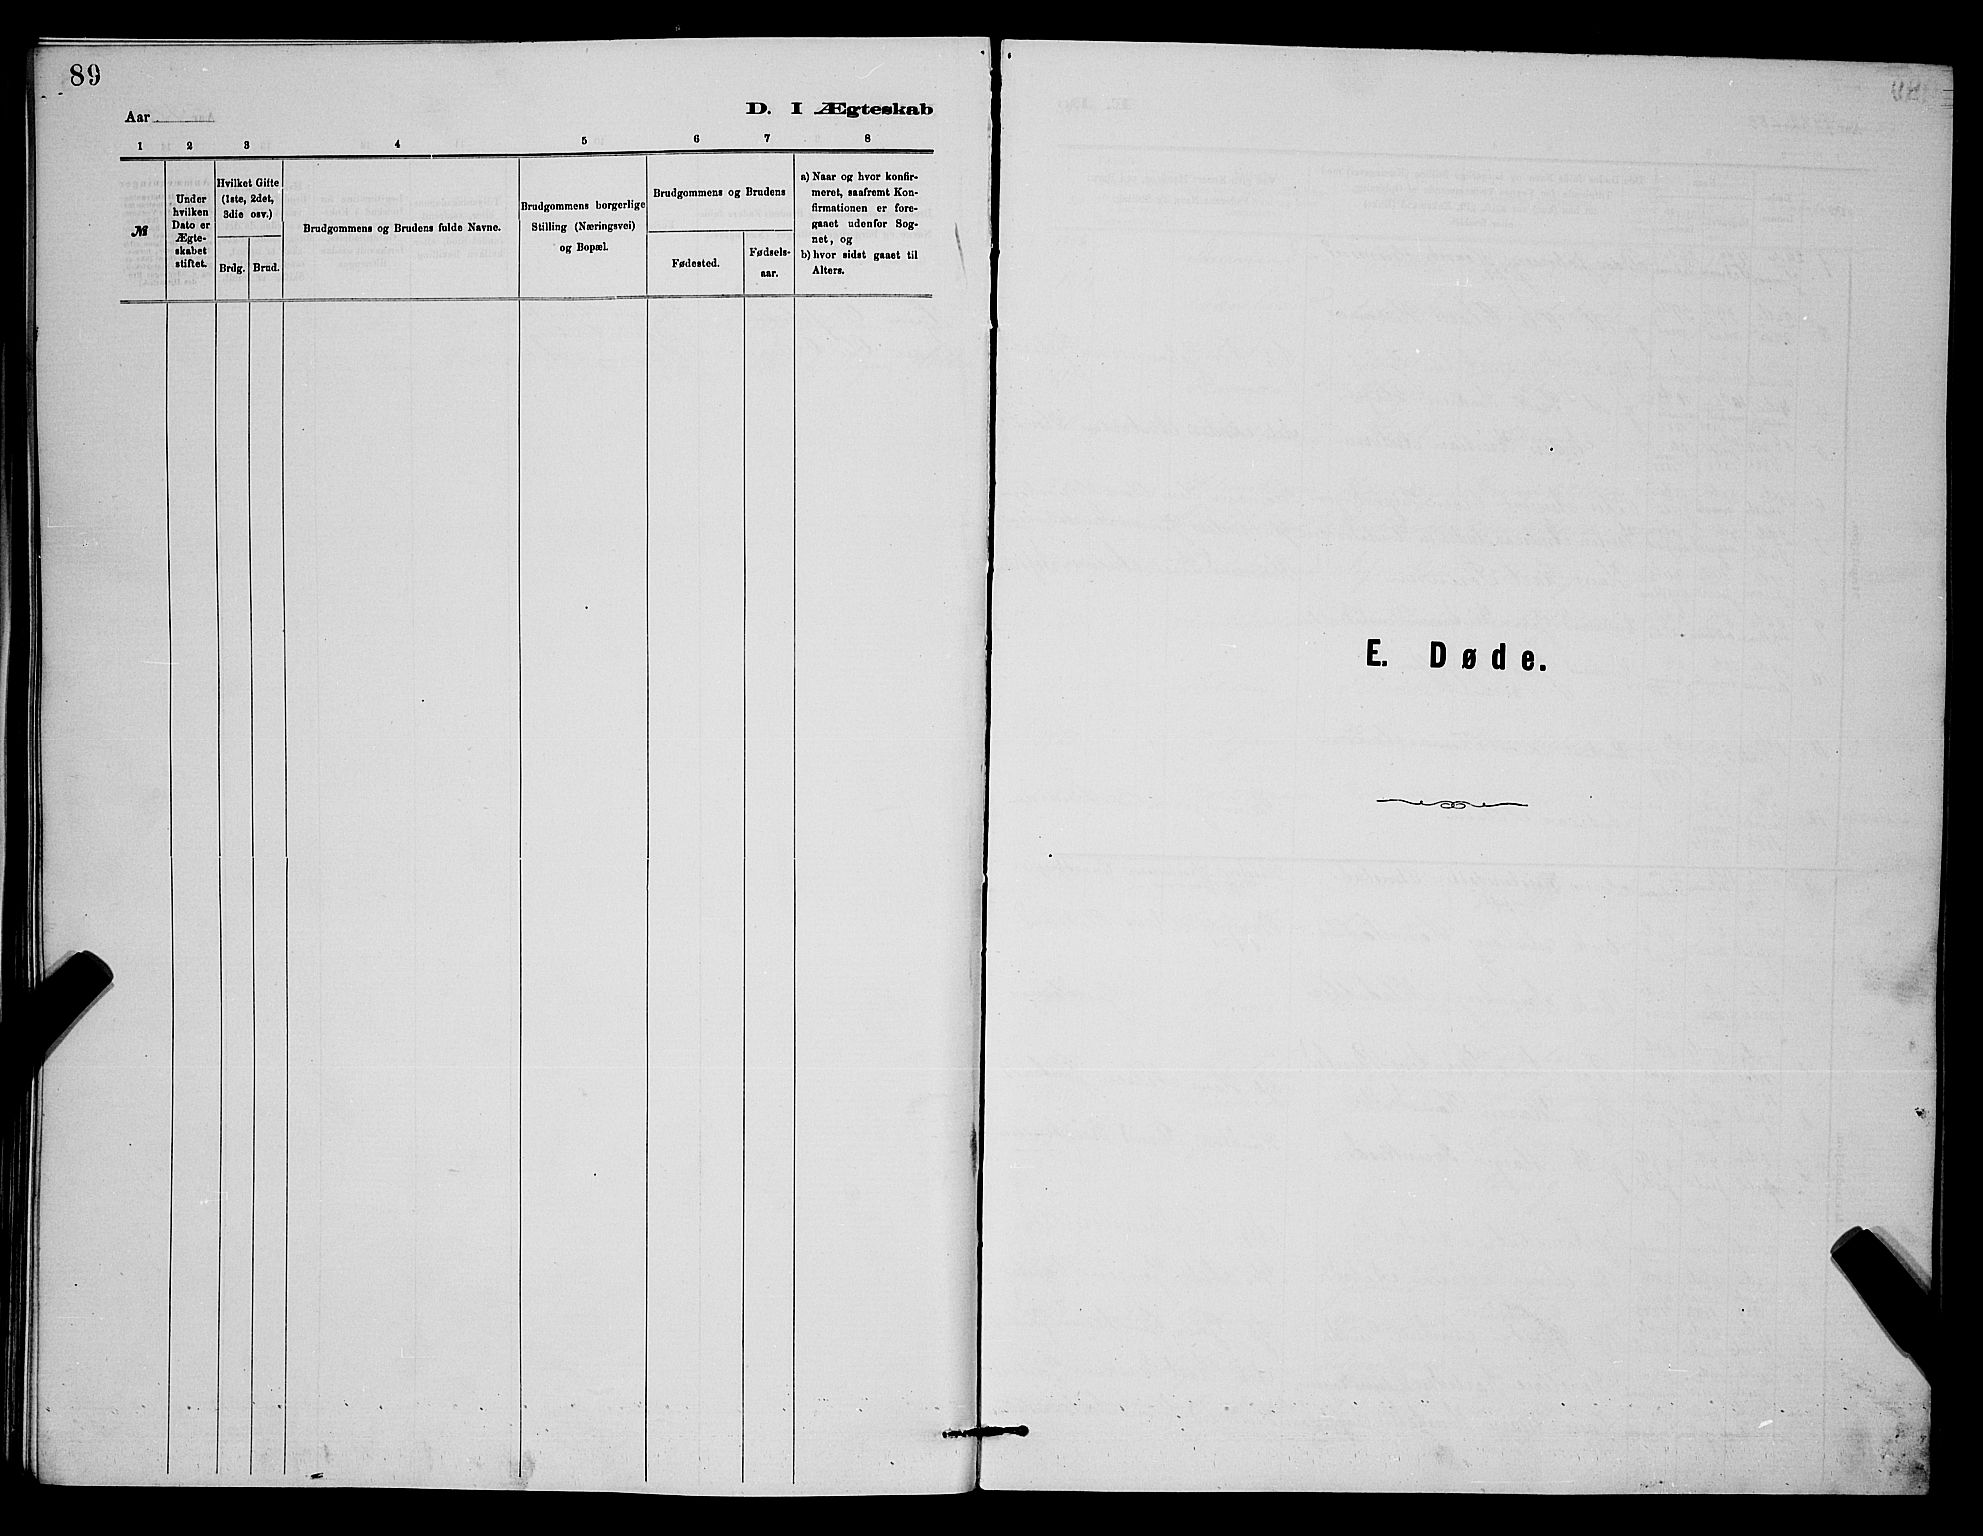 SAKO, Holla kirkebøker, G/Gb/L0001: Klokkerbok nr. II 1, 1882-1897, s. 89